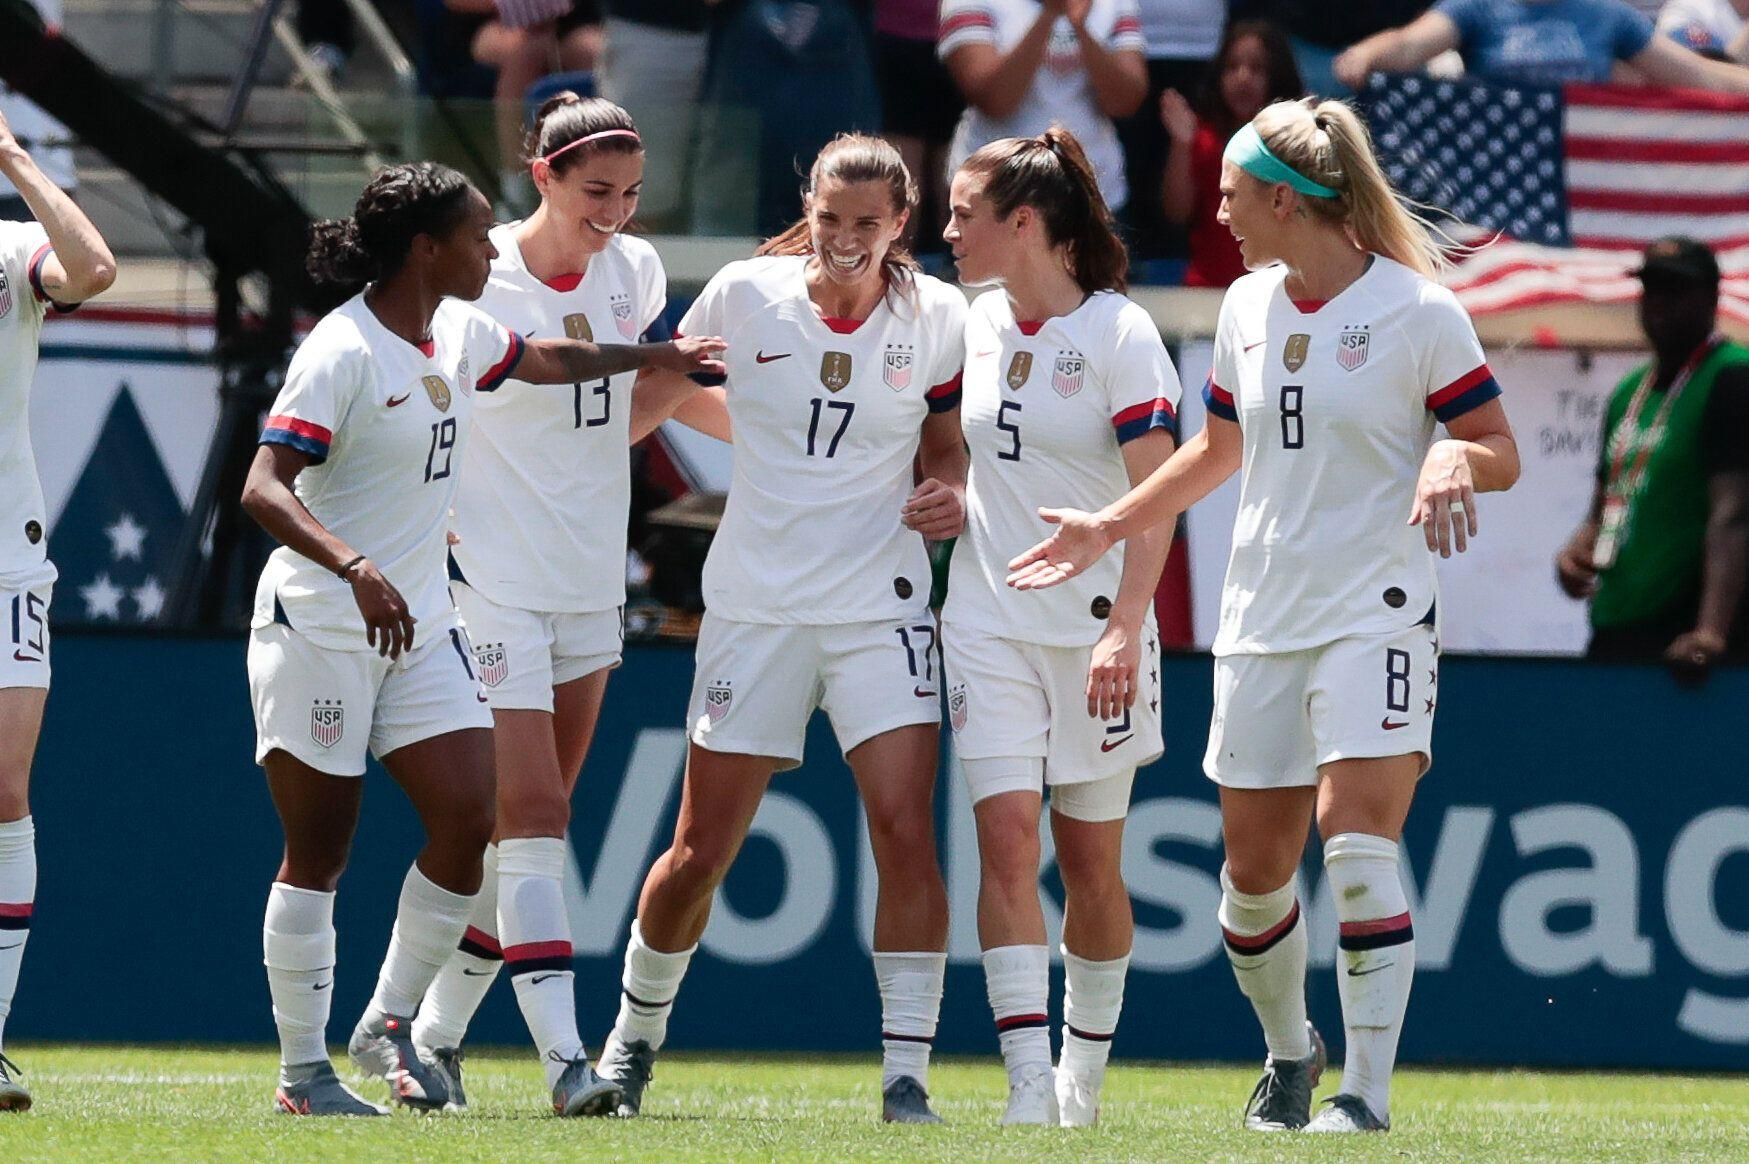 womens football increasing - HD1749×1164